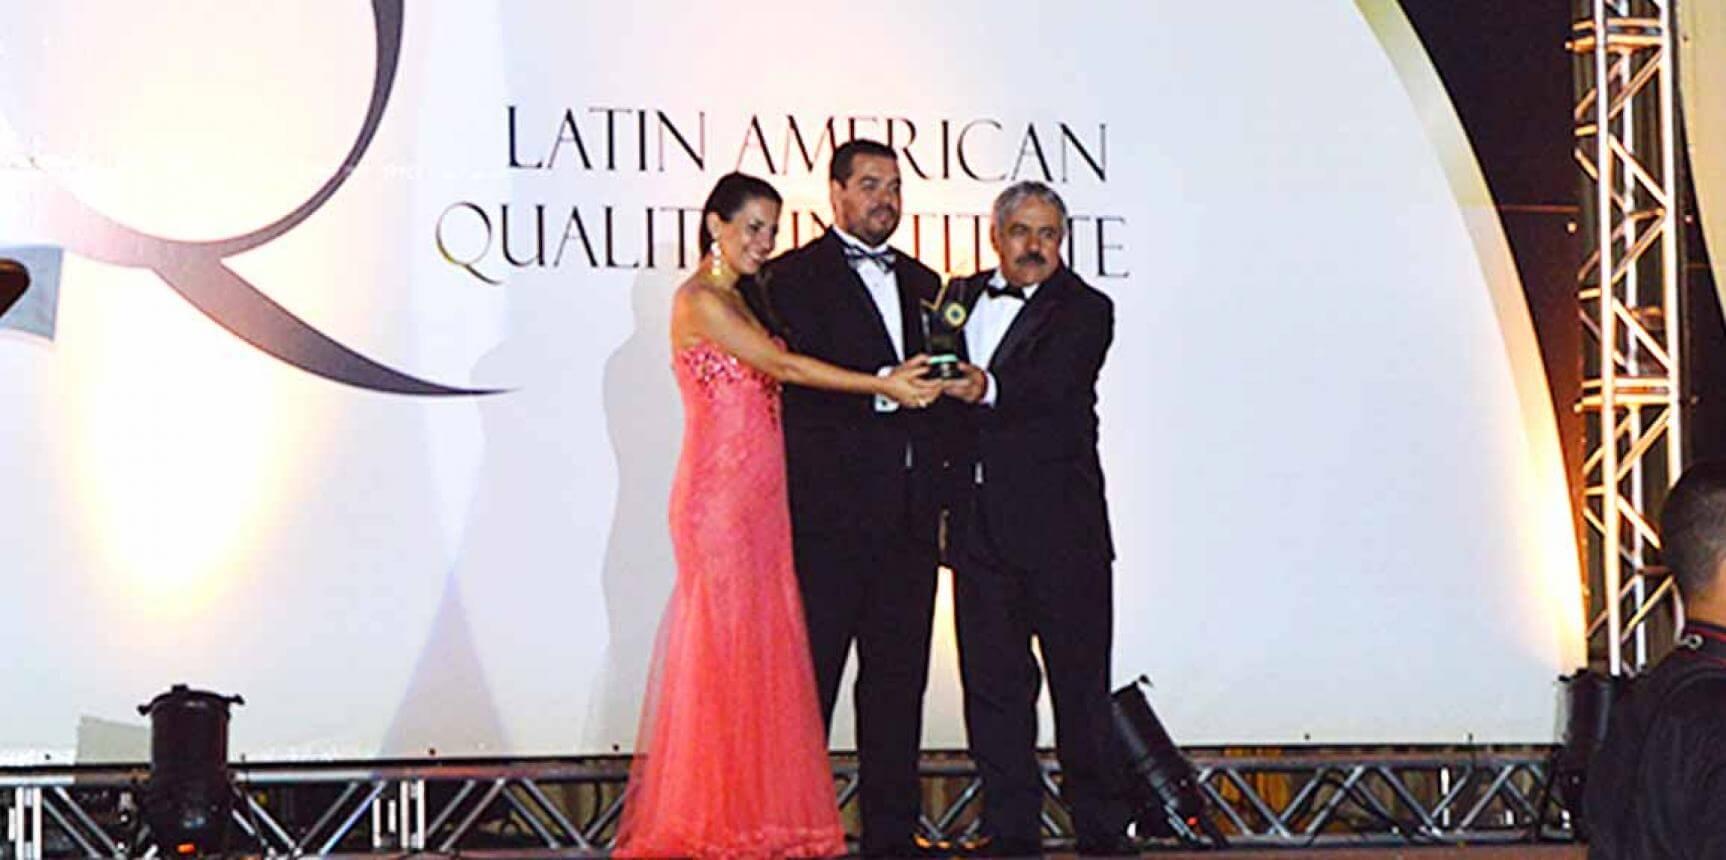 img-Premio laqi 2014-09022016